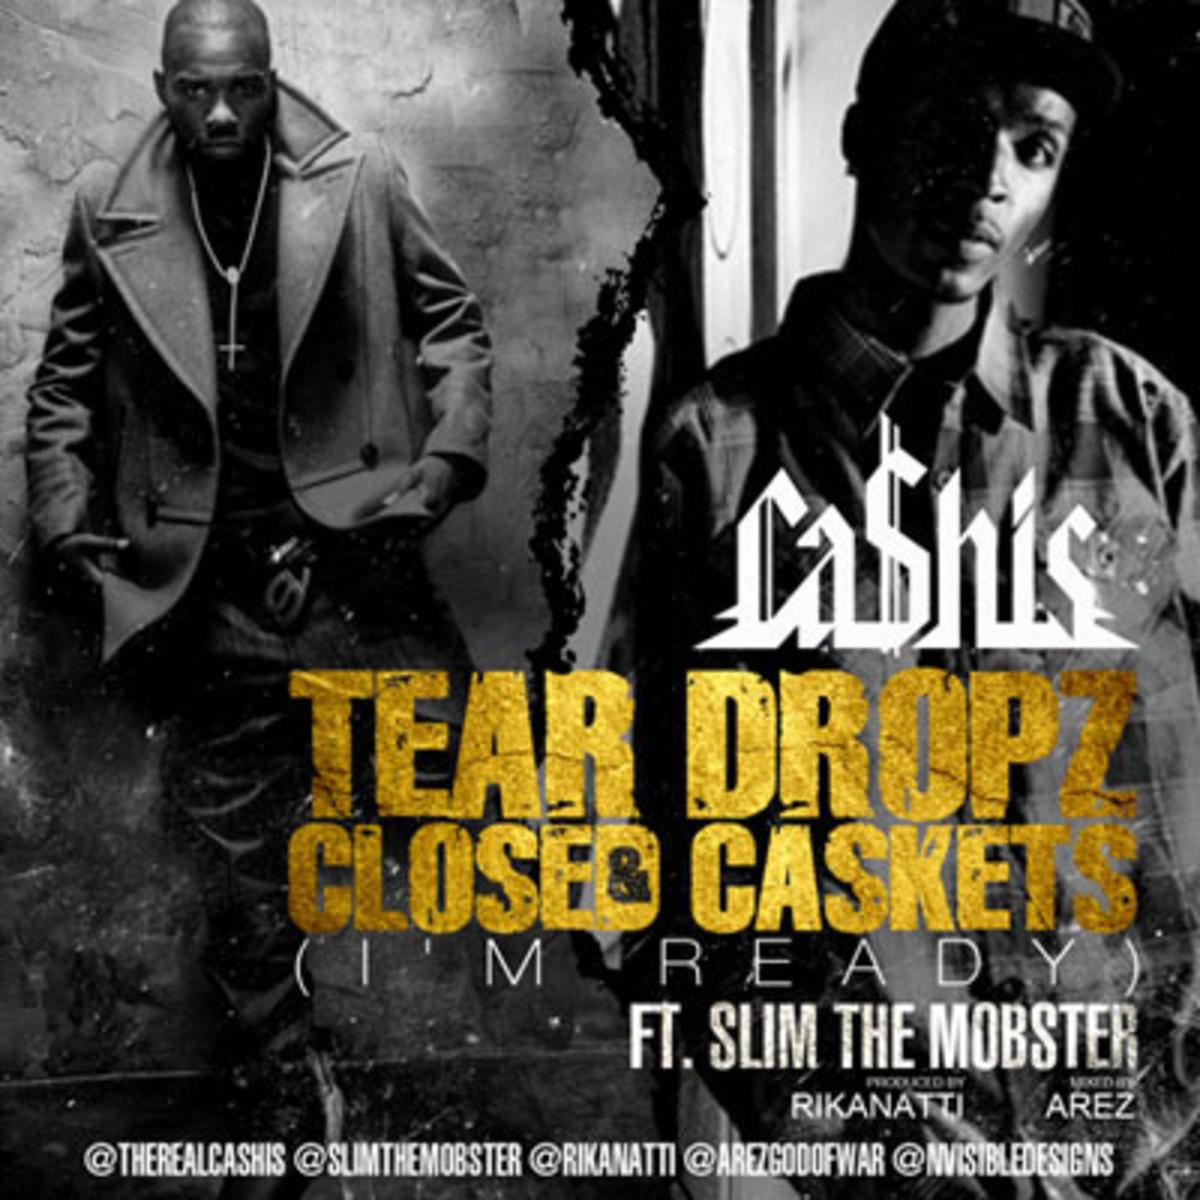 cashis-teardrops.jpg